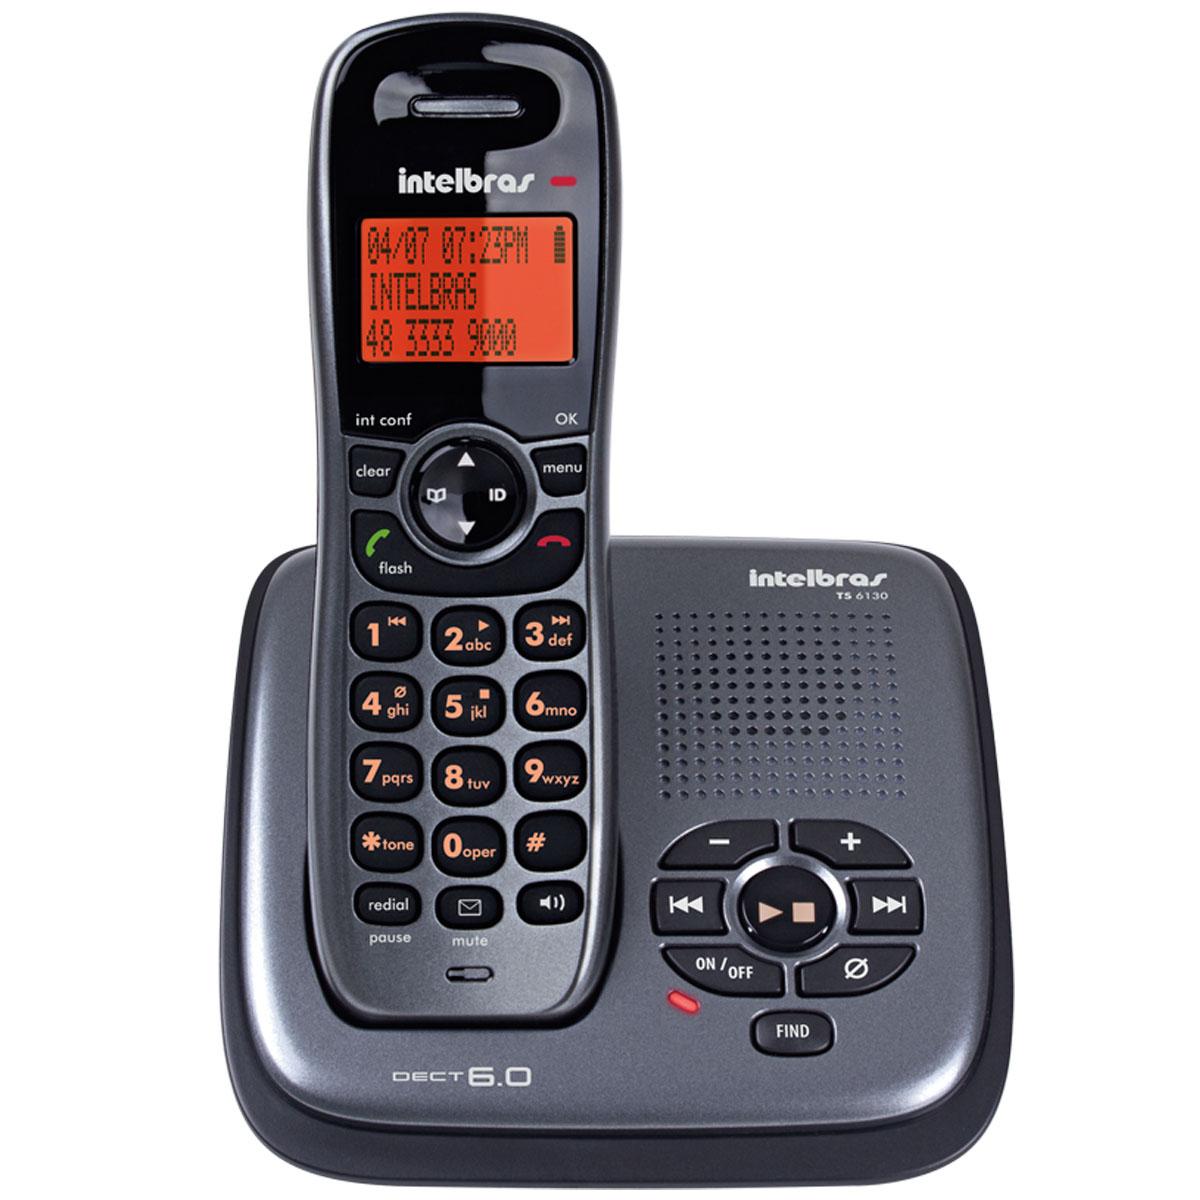 Telefone Intelbras TS 6130 sem fio